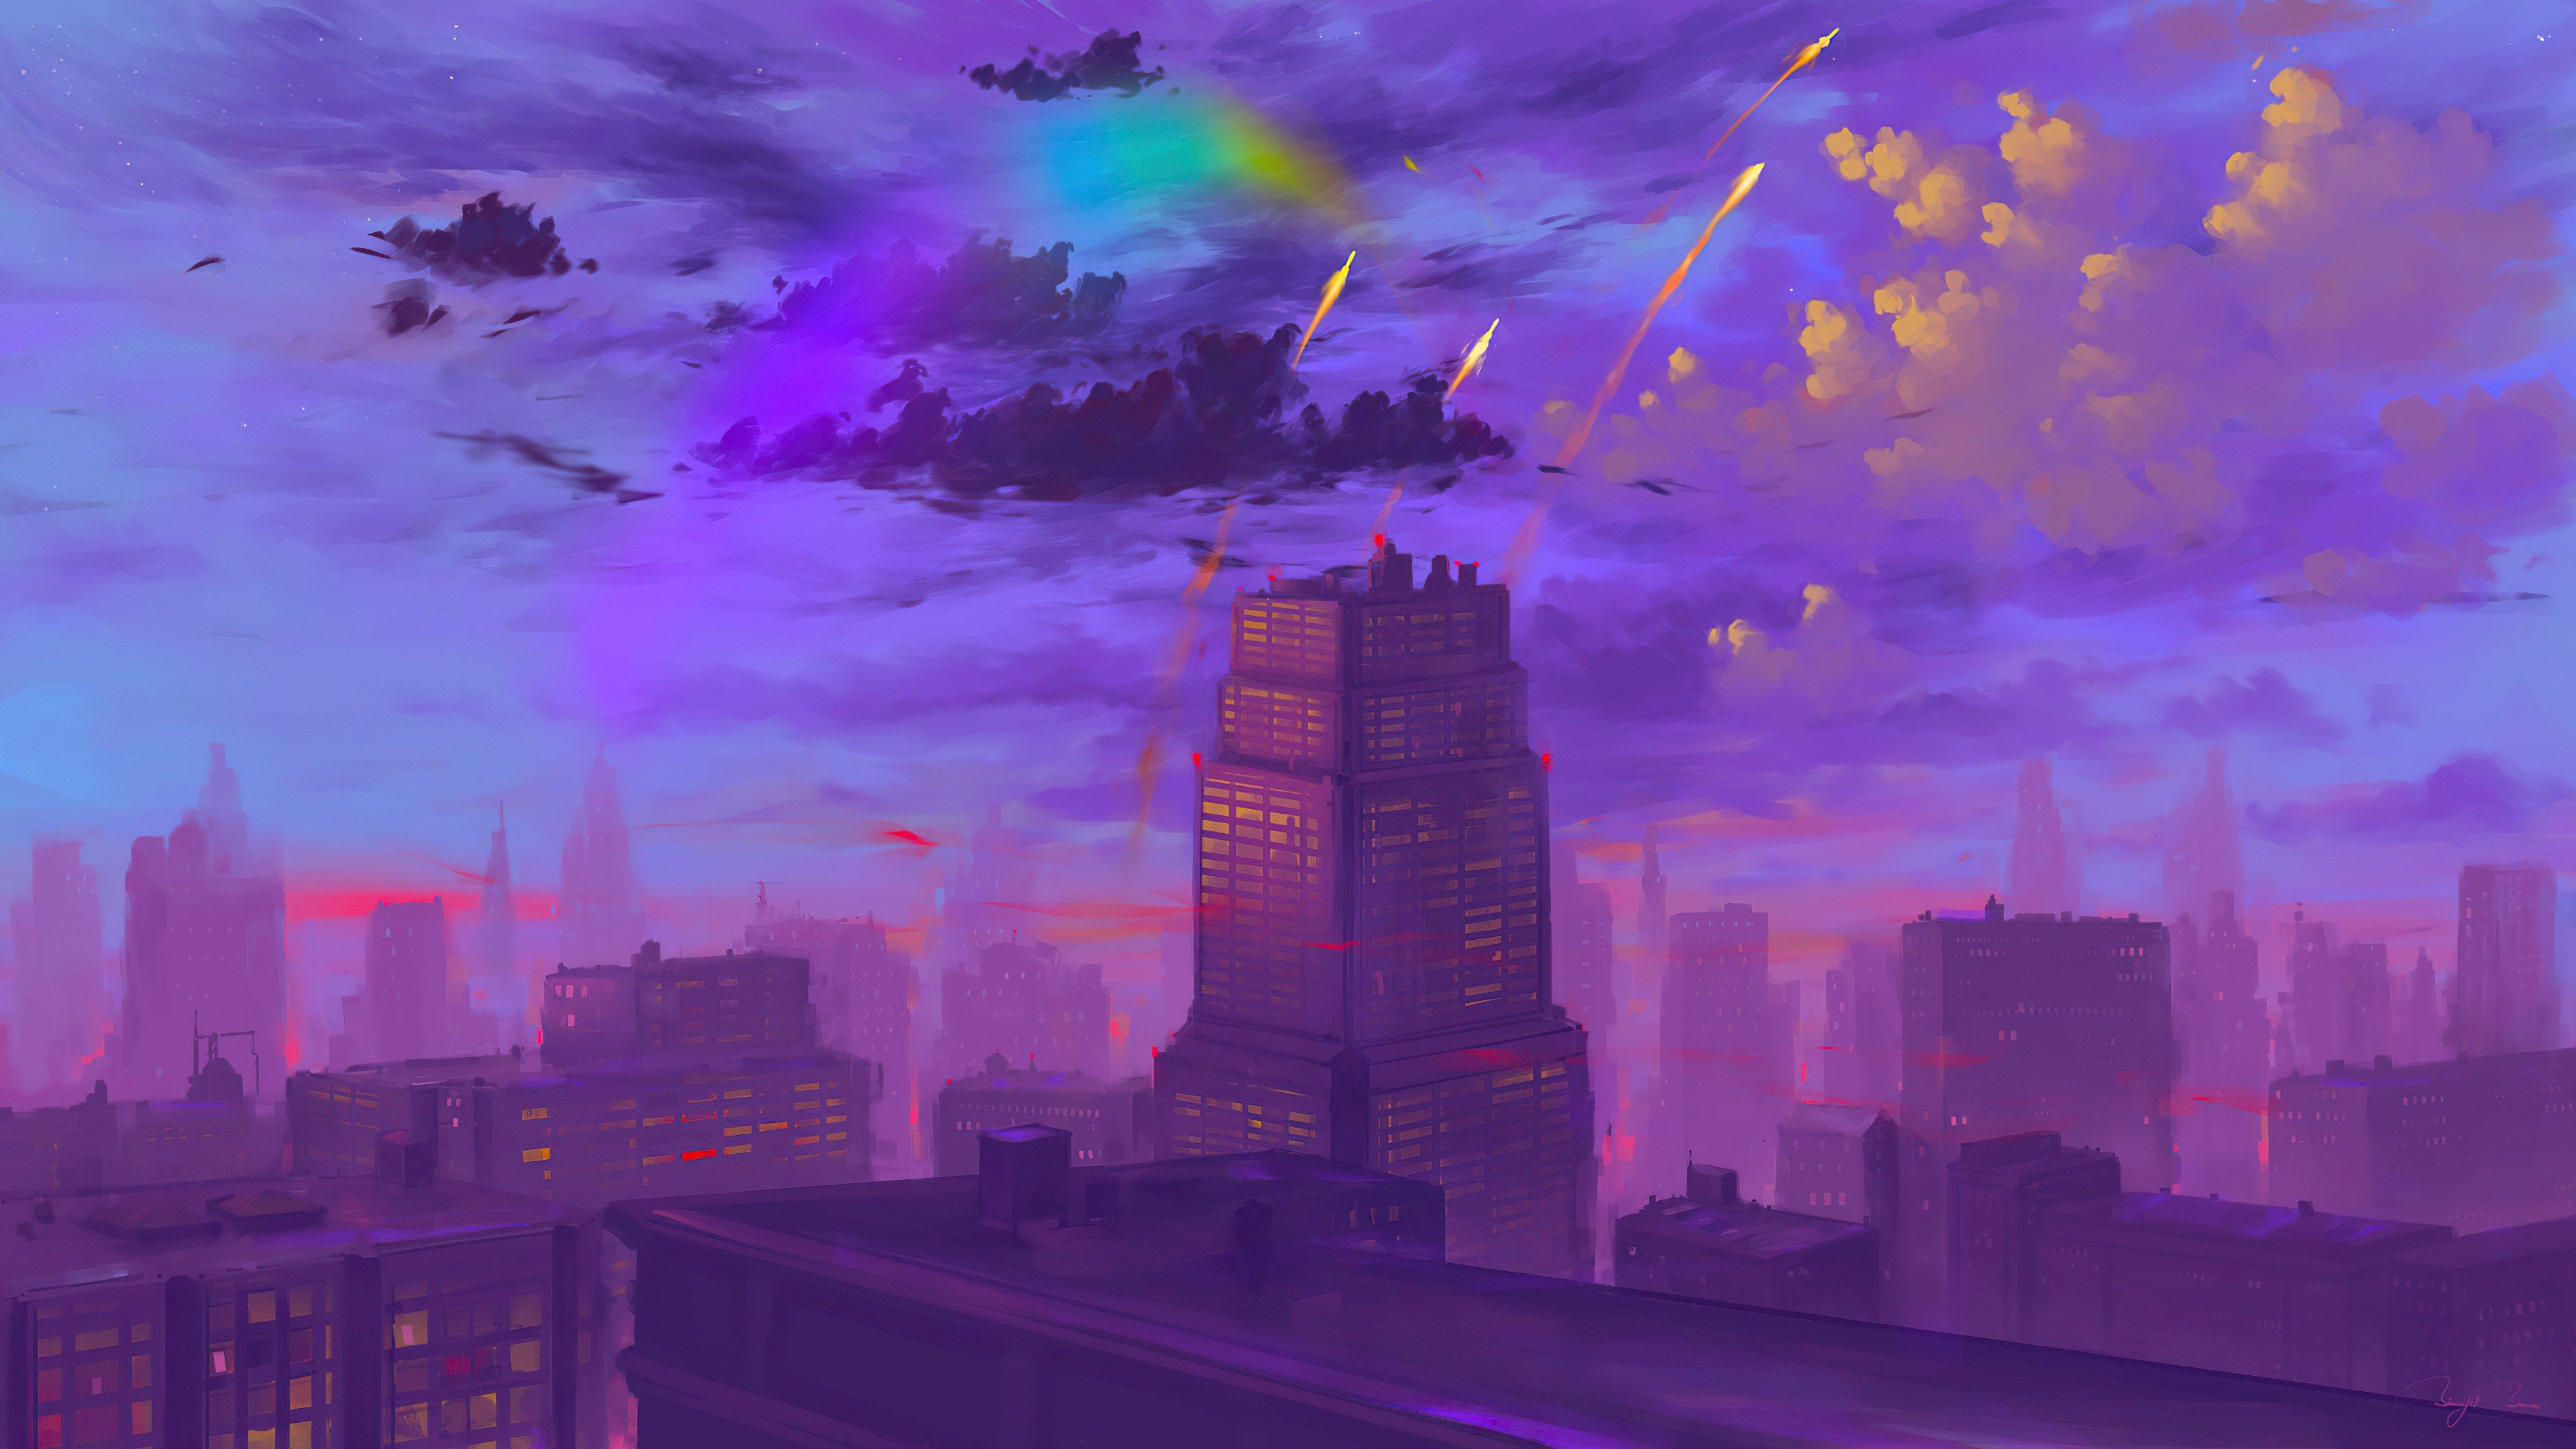 Wallpaper Sunset in the city Illustration